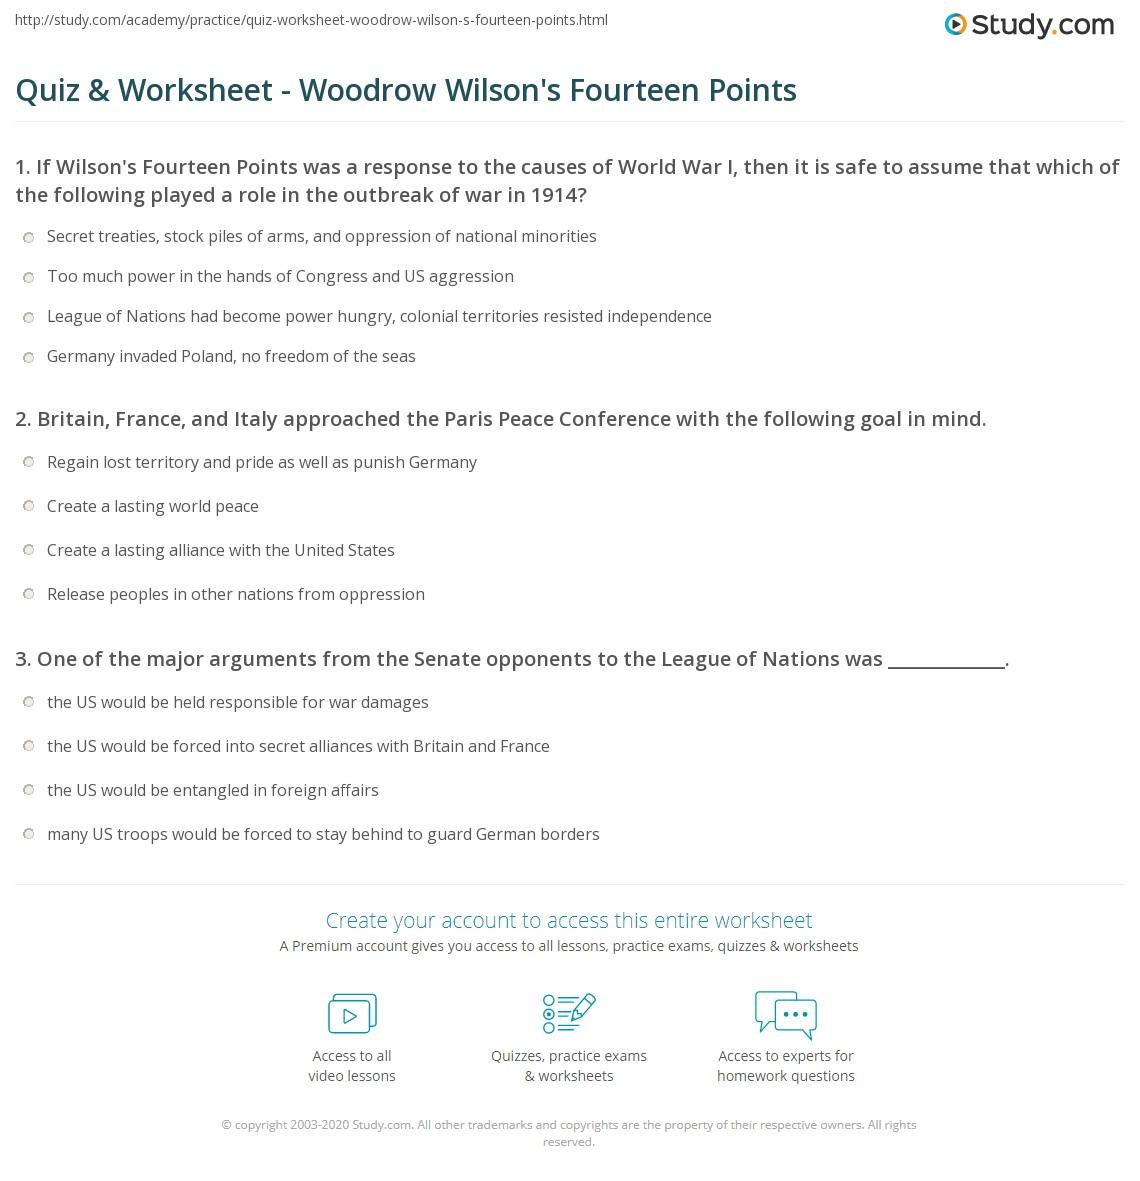 wilson s fourteen points simplified. Black Bedroom Furniture Sets. Home Design Ideas